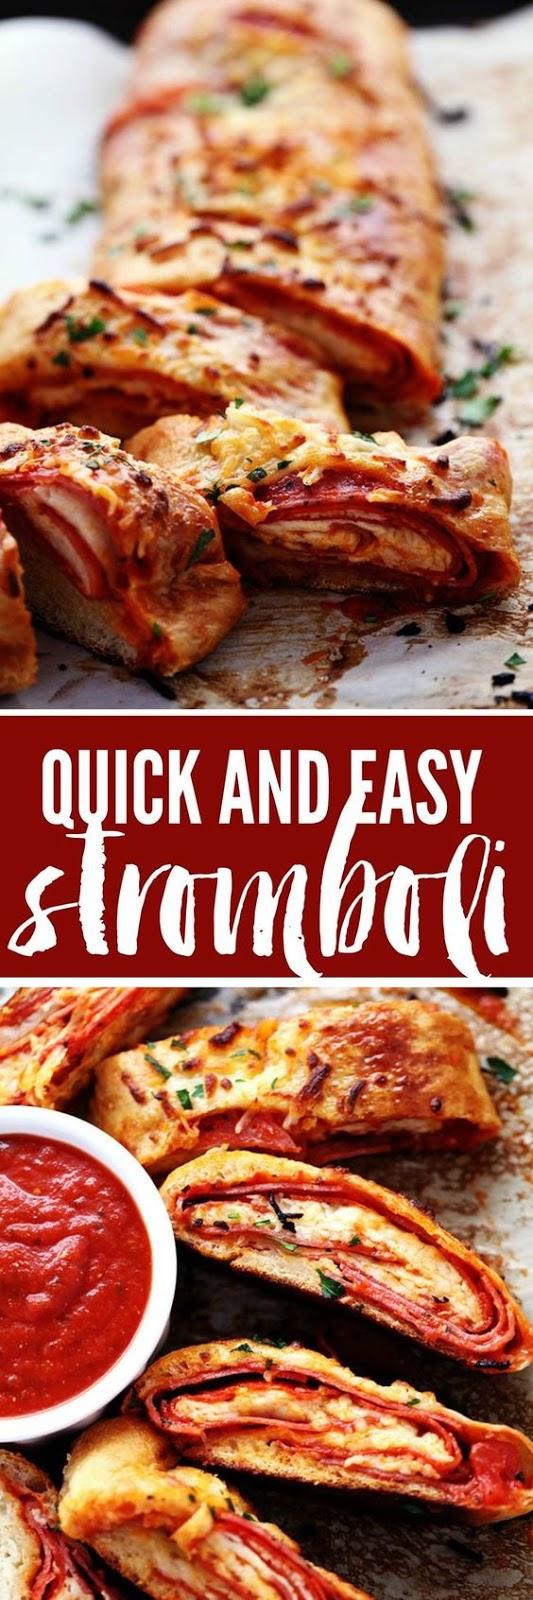 QUICK AND EASY STROMBOLI #Quick #Easy #Stromboli #Easyrecipe #Easydinner #Delecious